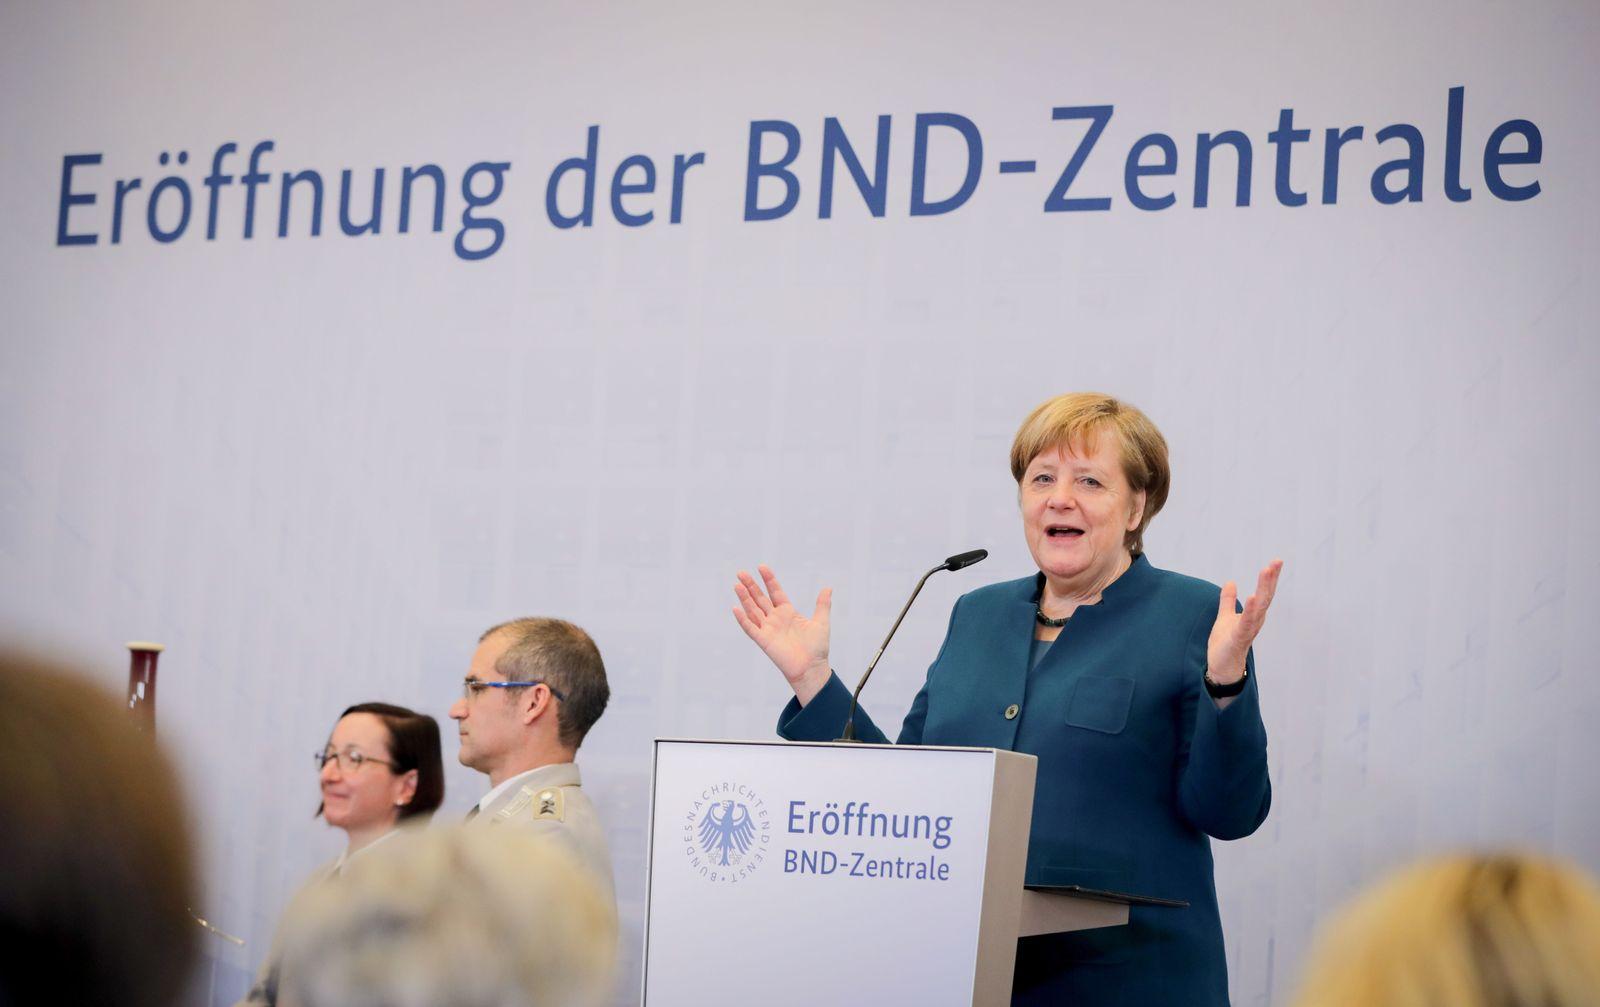 Angela Merkel BND-Zentrale